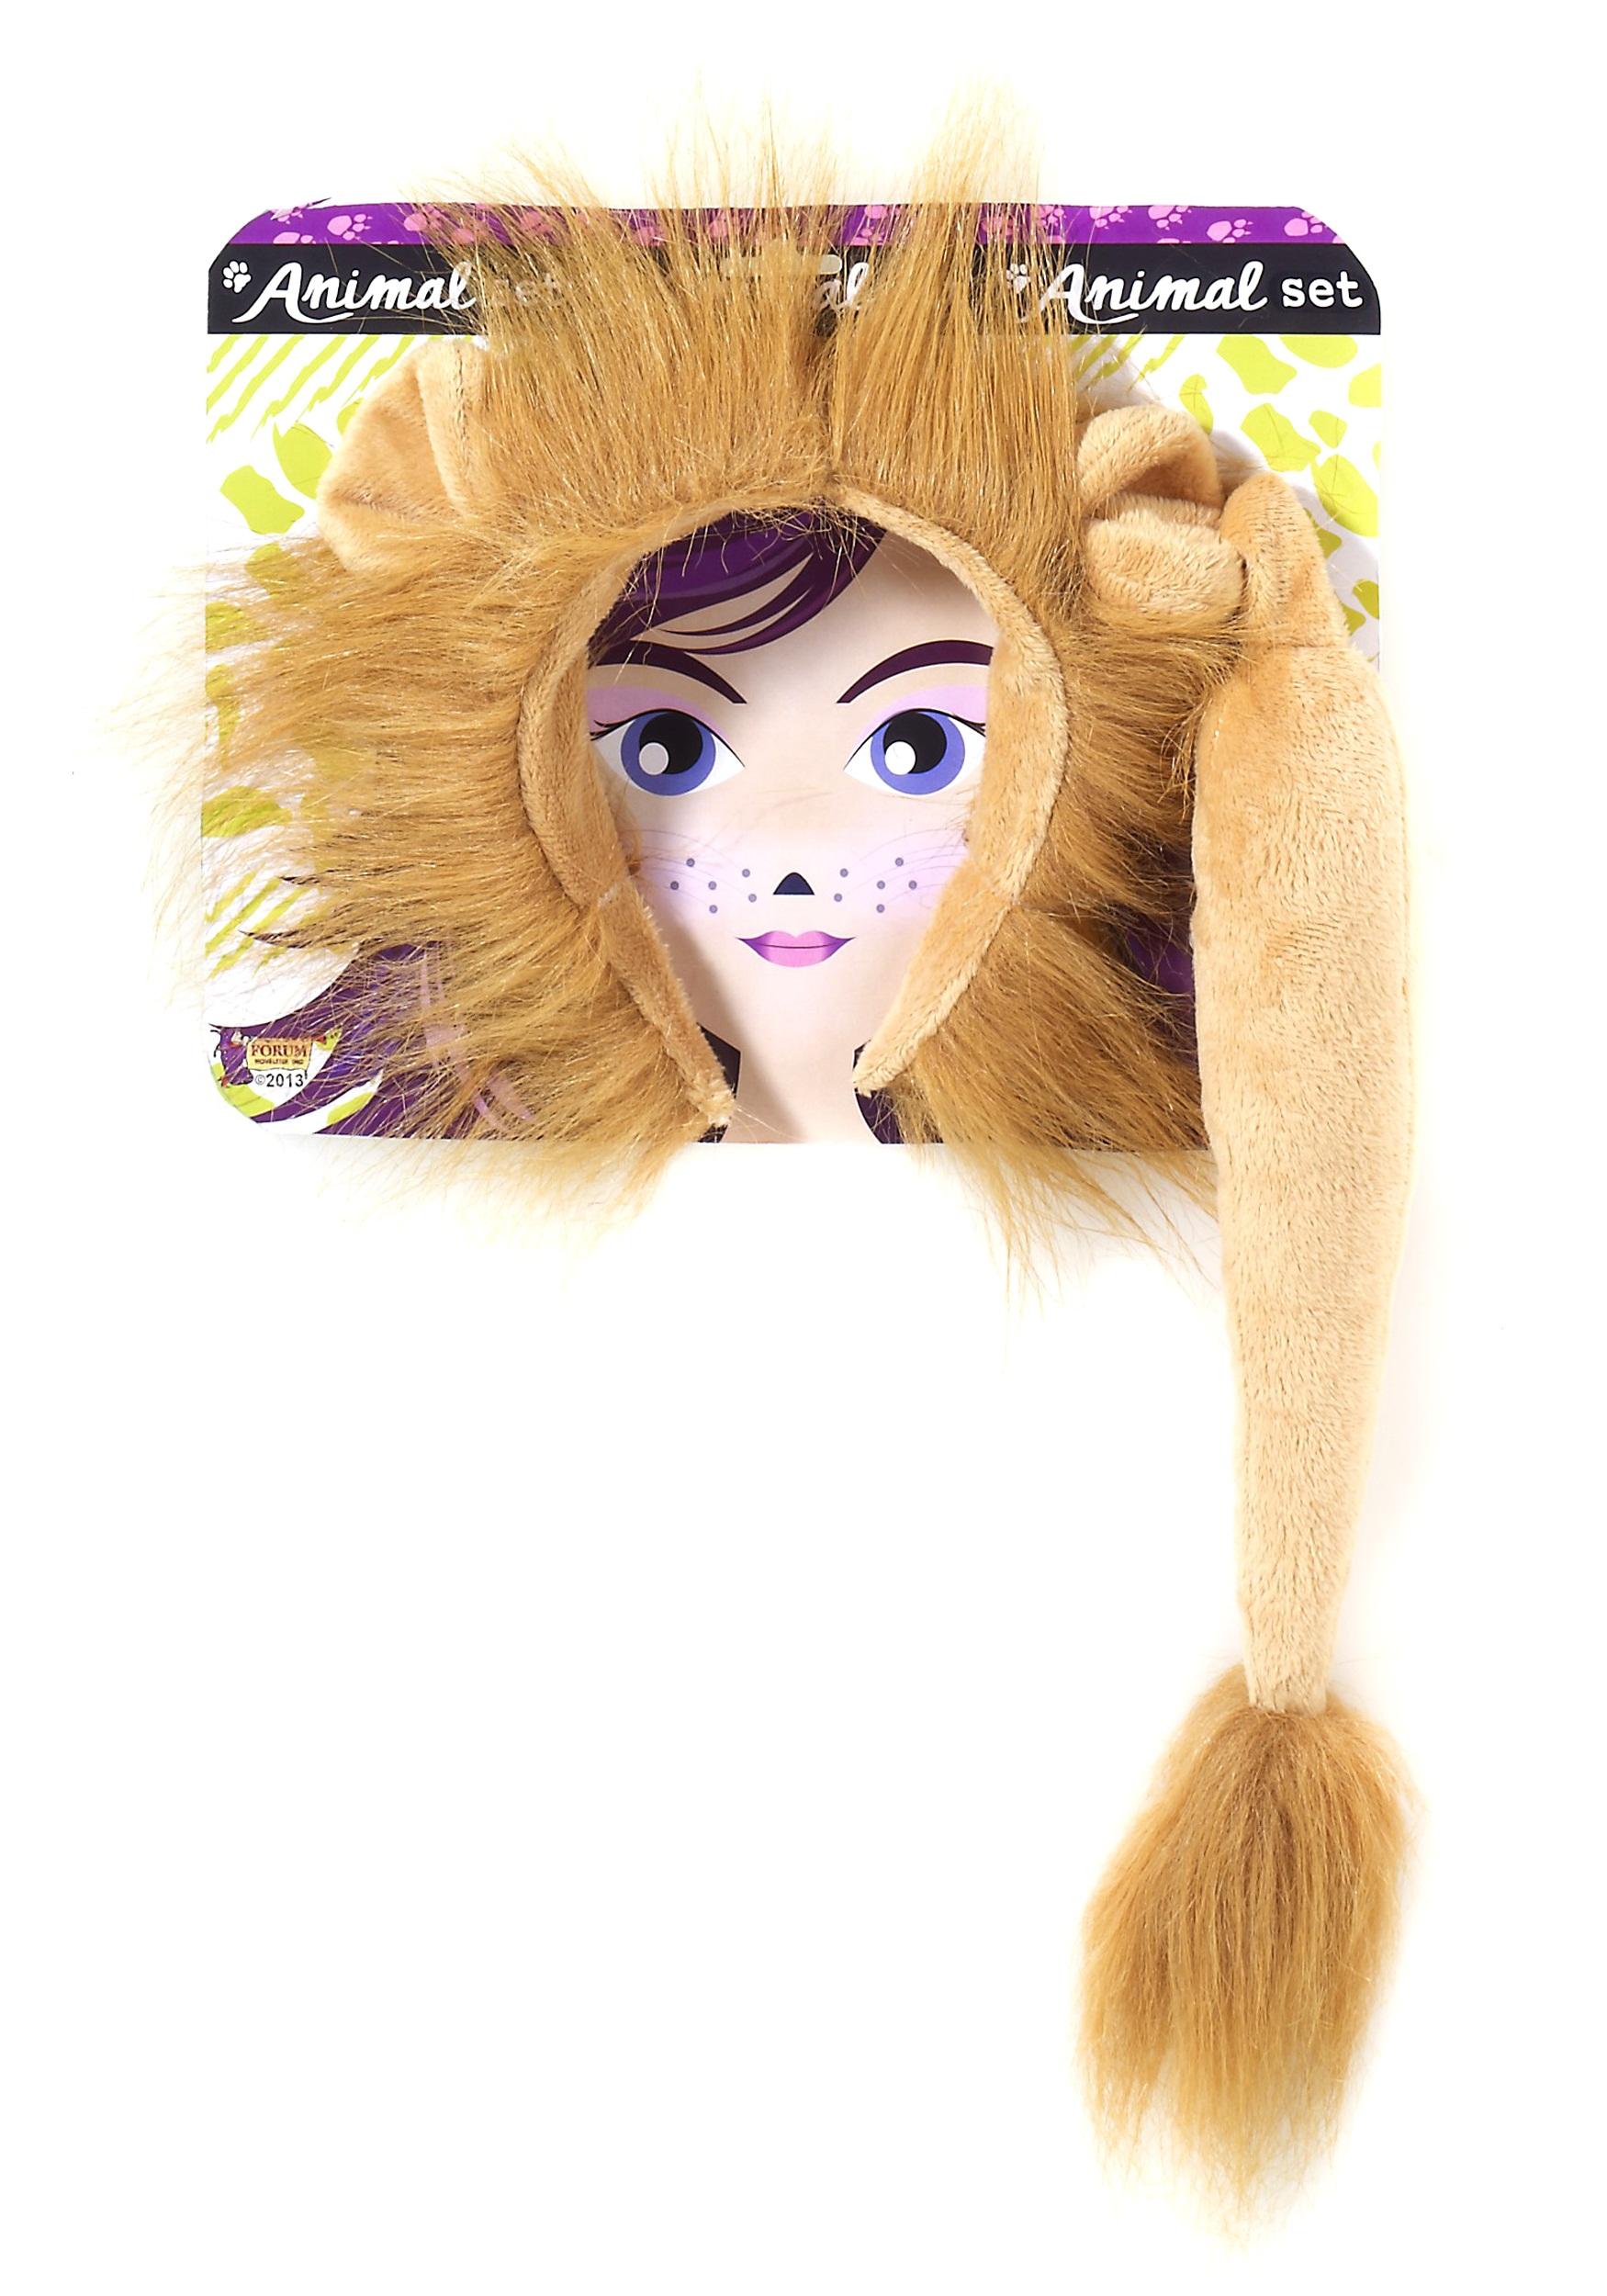 Lion tail costume - photo#6